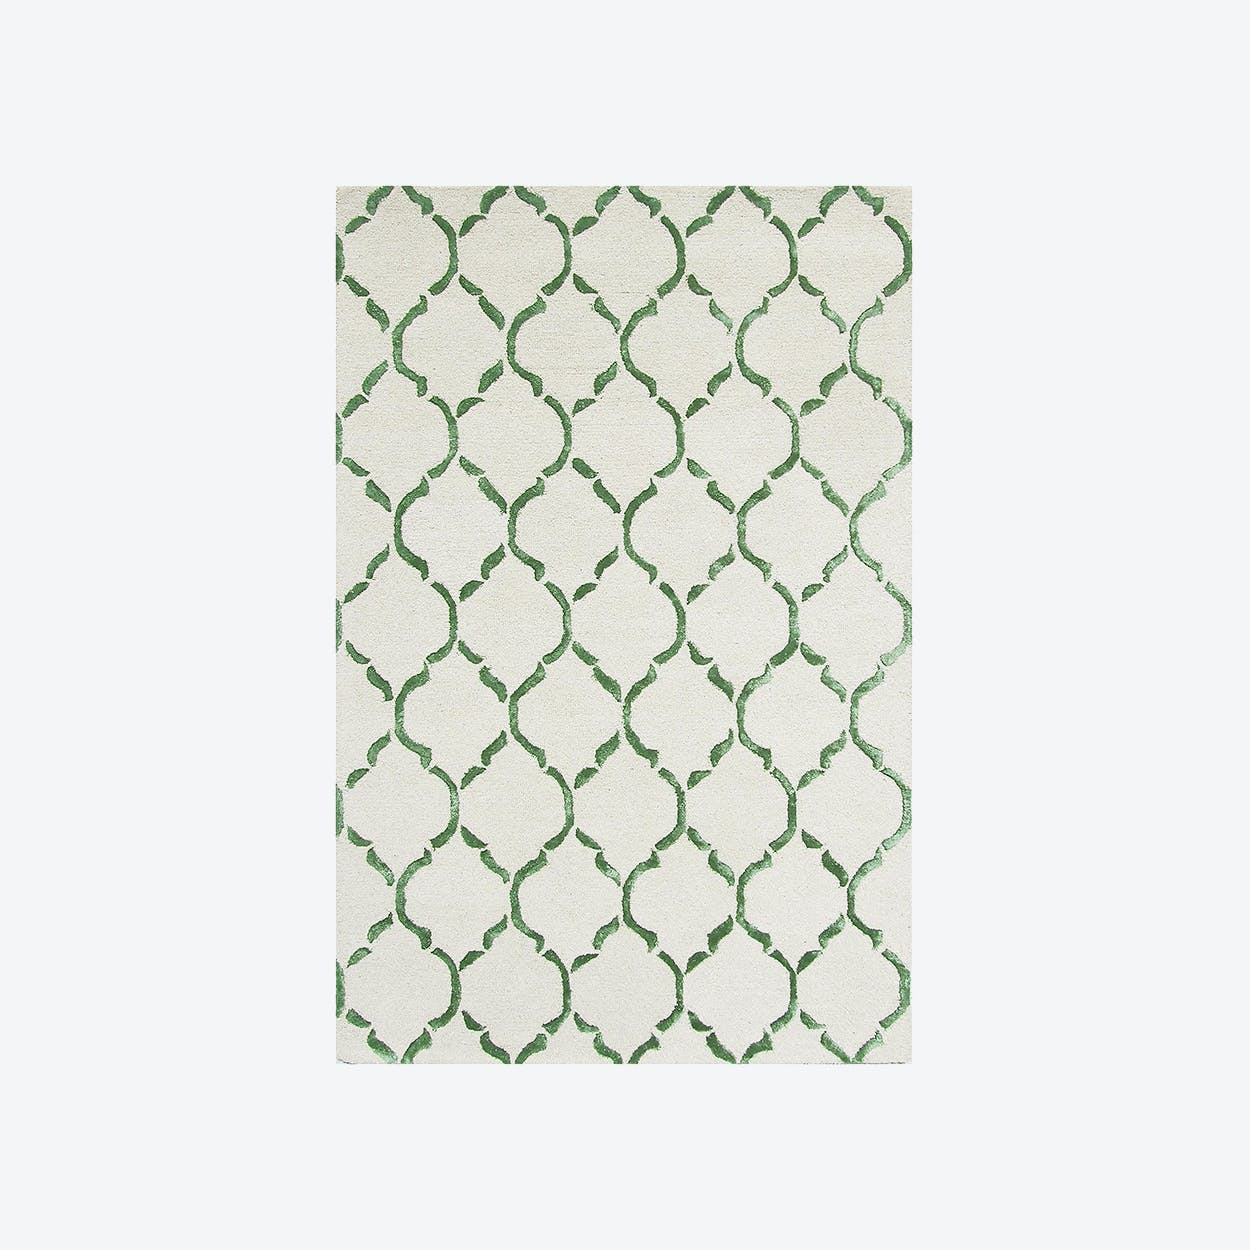 Chain Green Rug